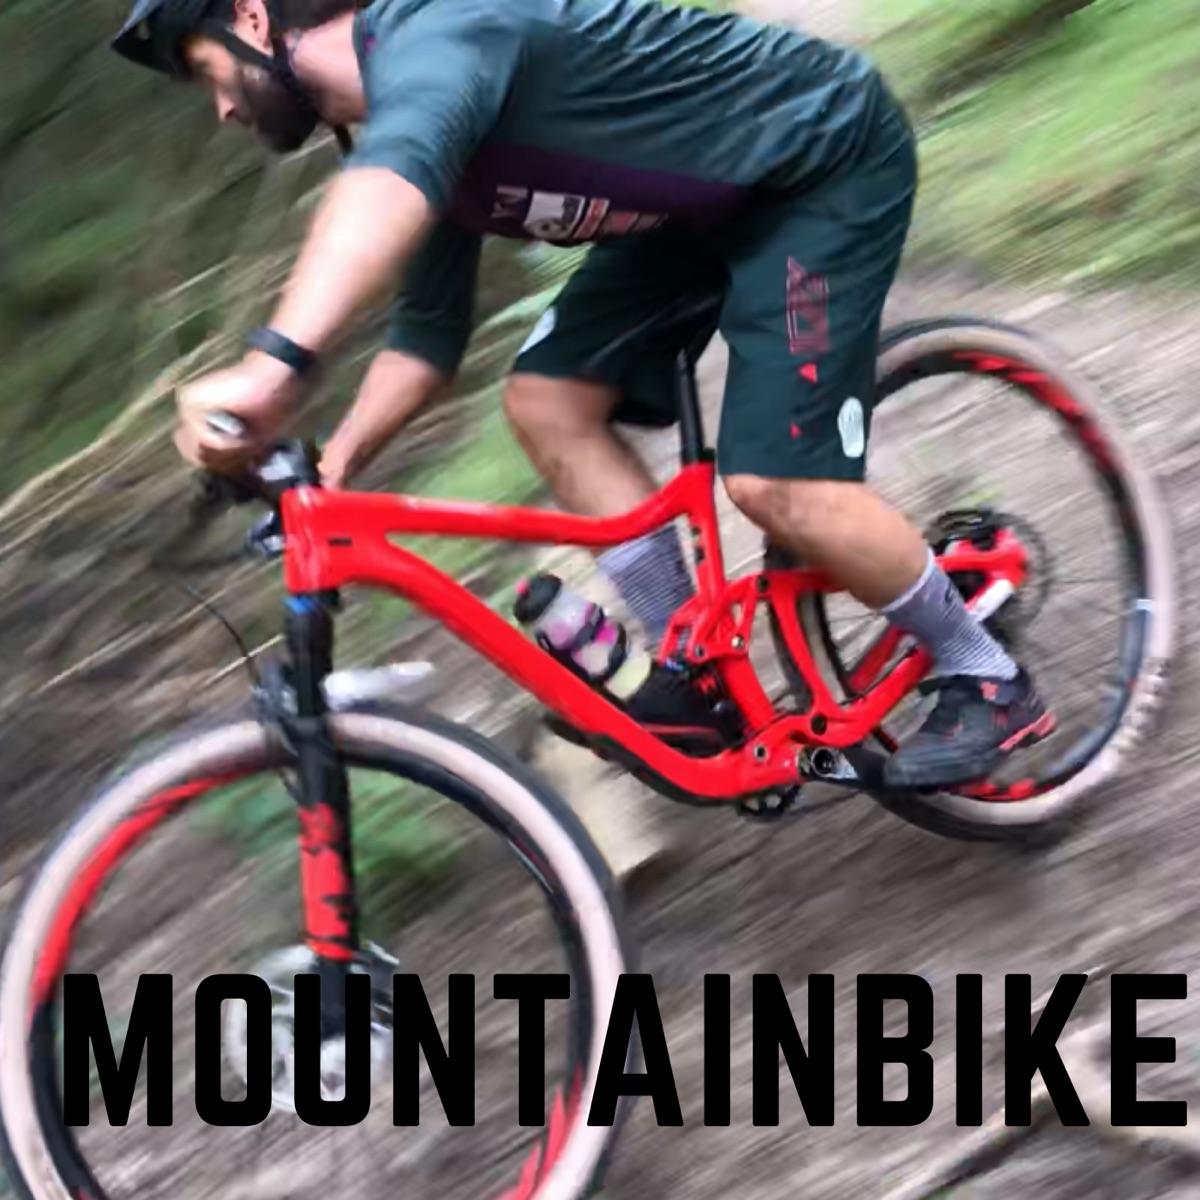 Mountainbike podcasten